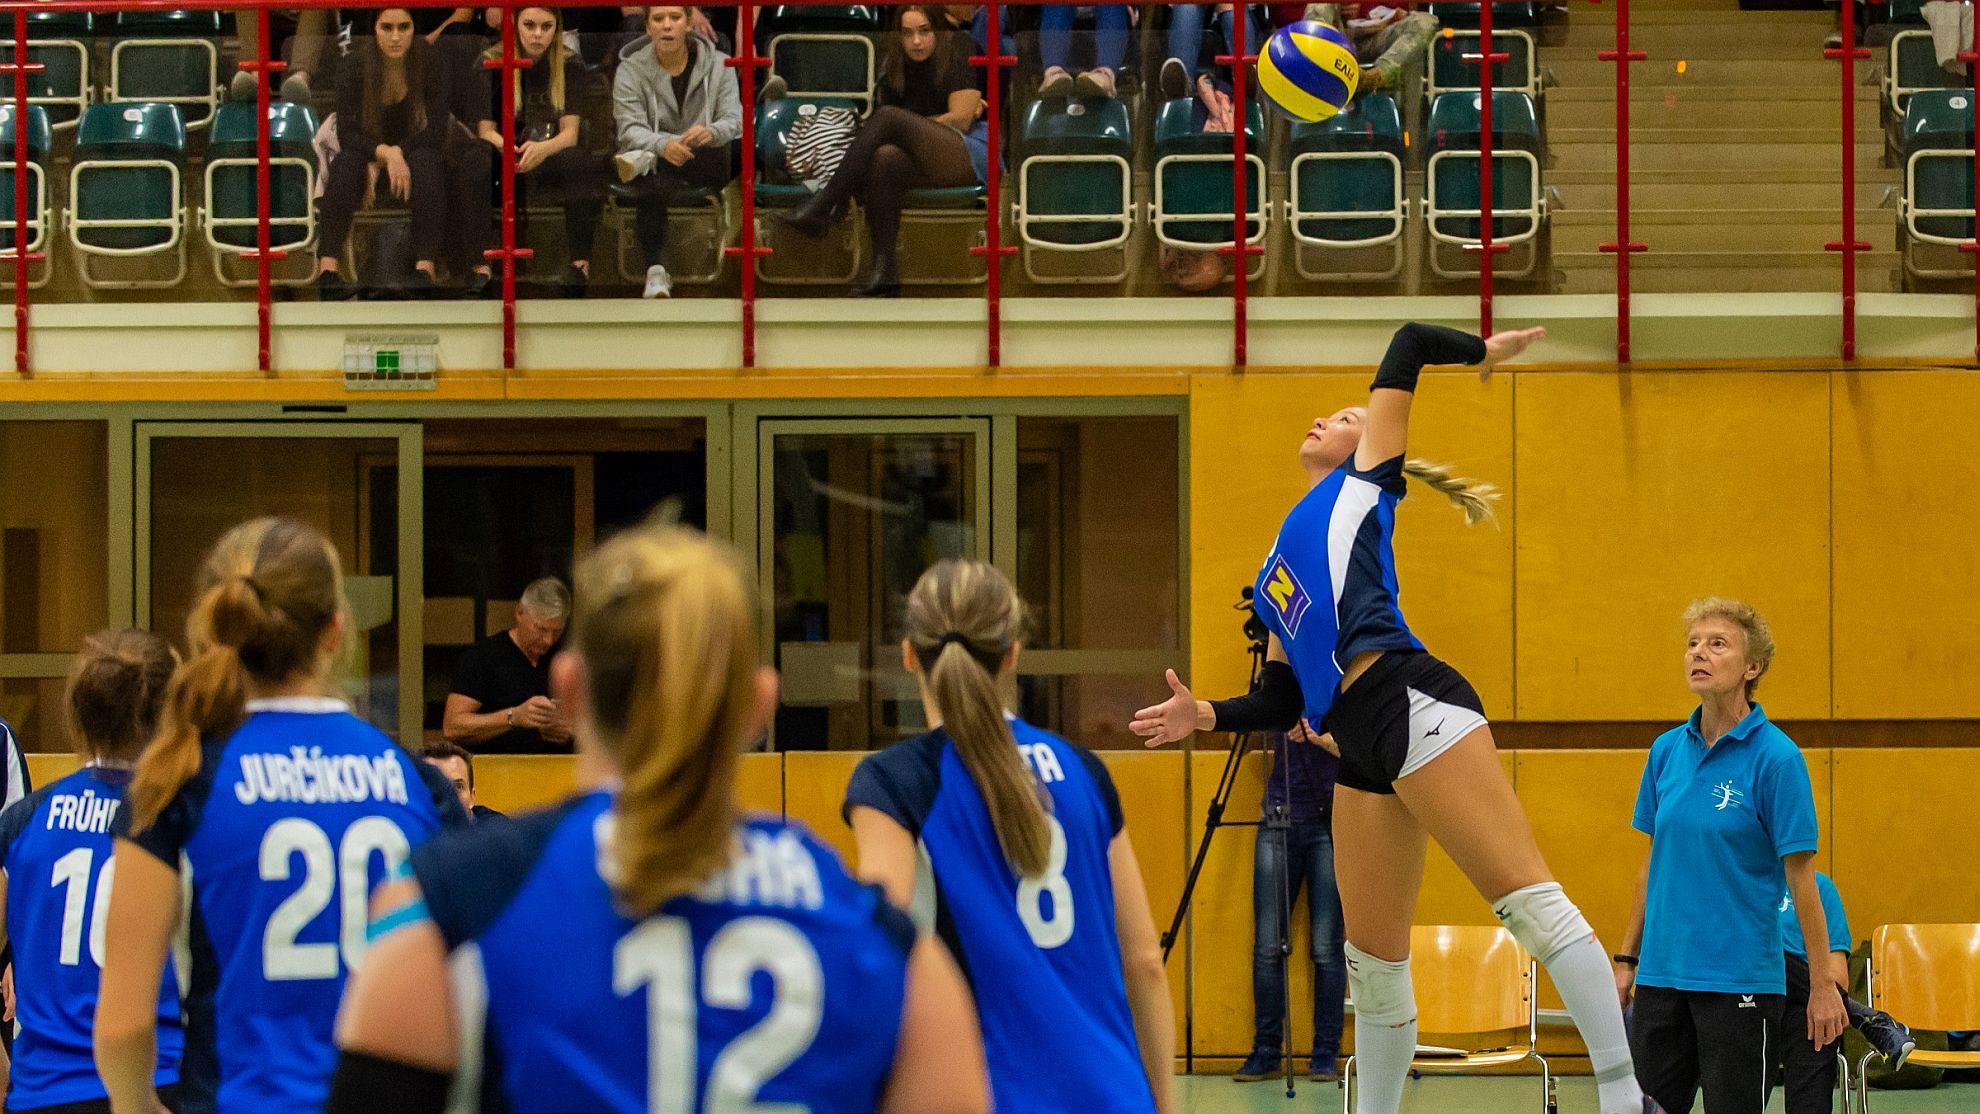 SG VB NÖ Sokol/Post 2018 - FOTO © dapetykaan/Peter Eichstädt